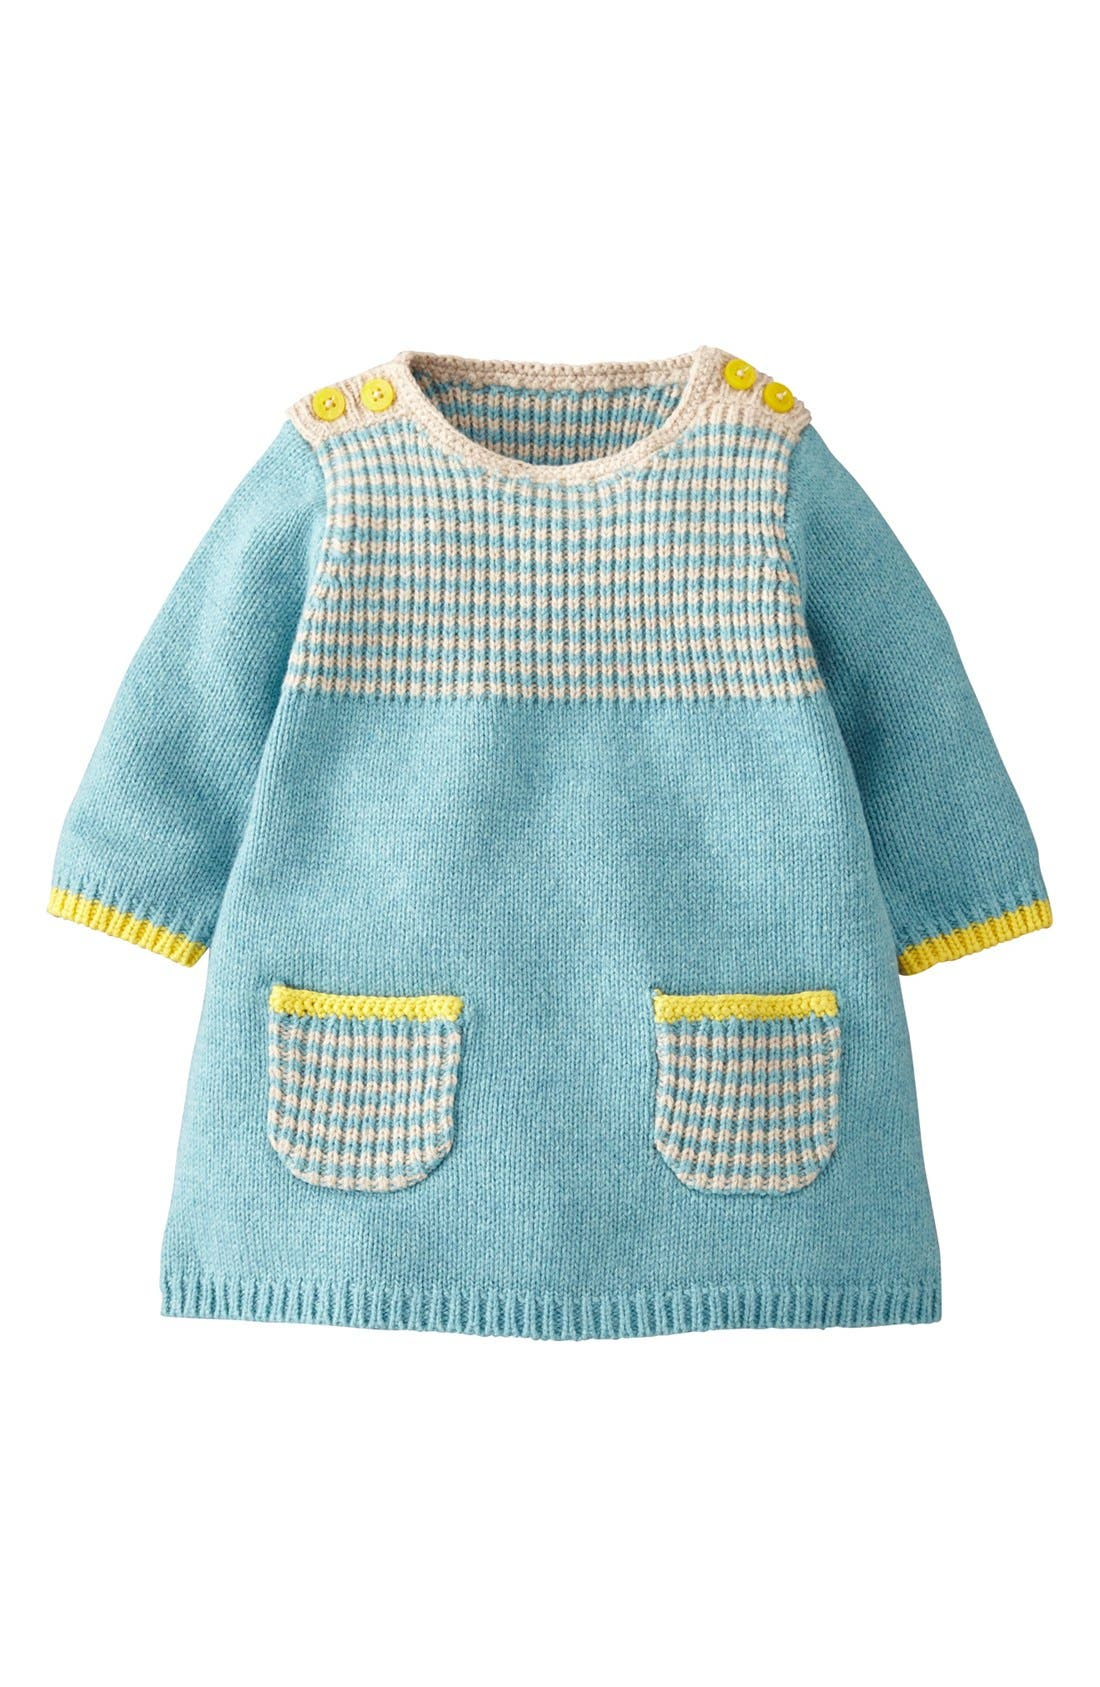 Alternate Image 1 Selected - Mini Boden 'Stripey' Knit Dress (Baby Girls)